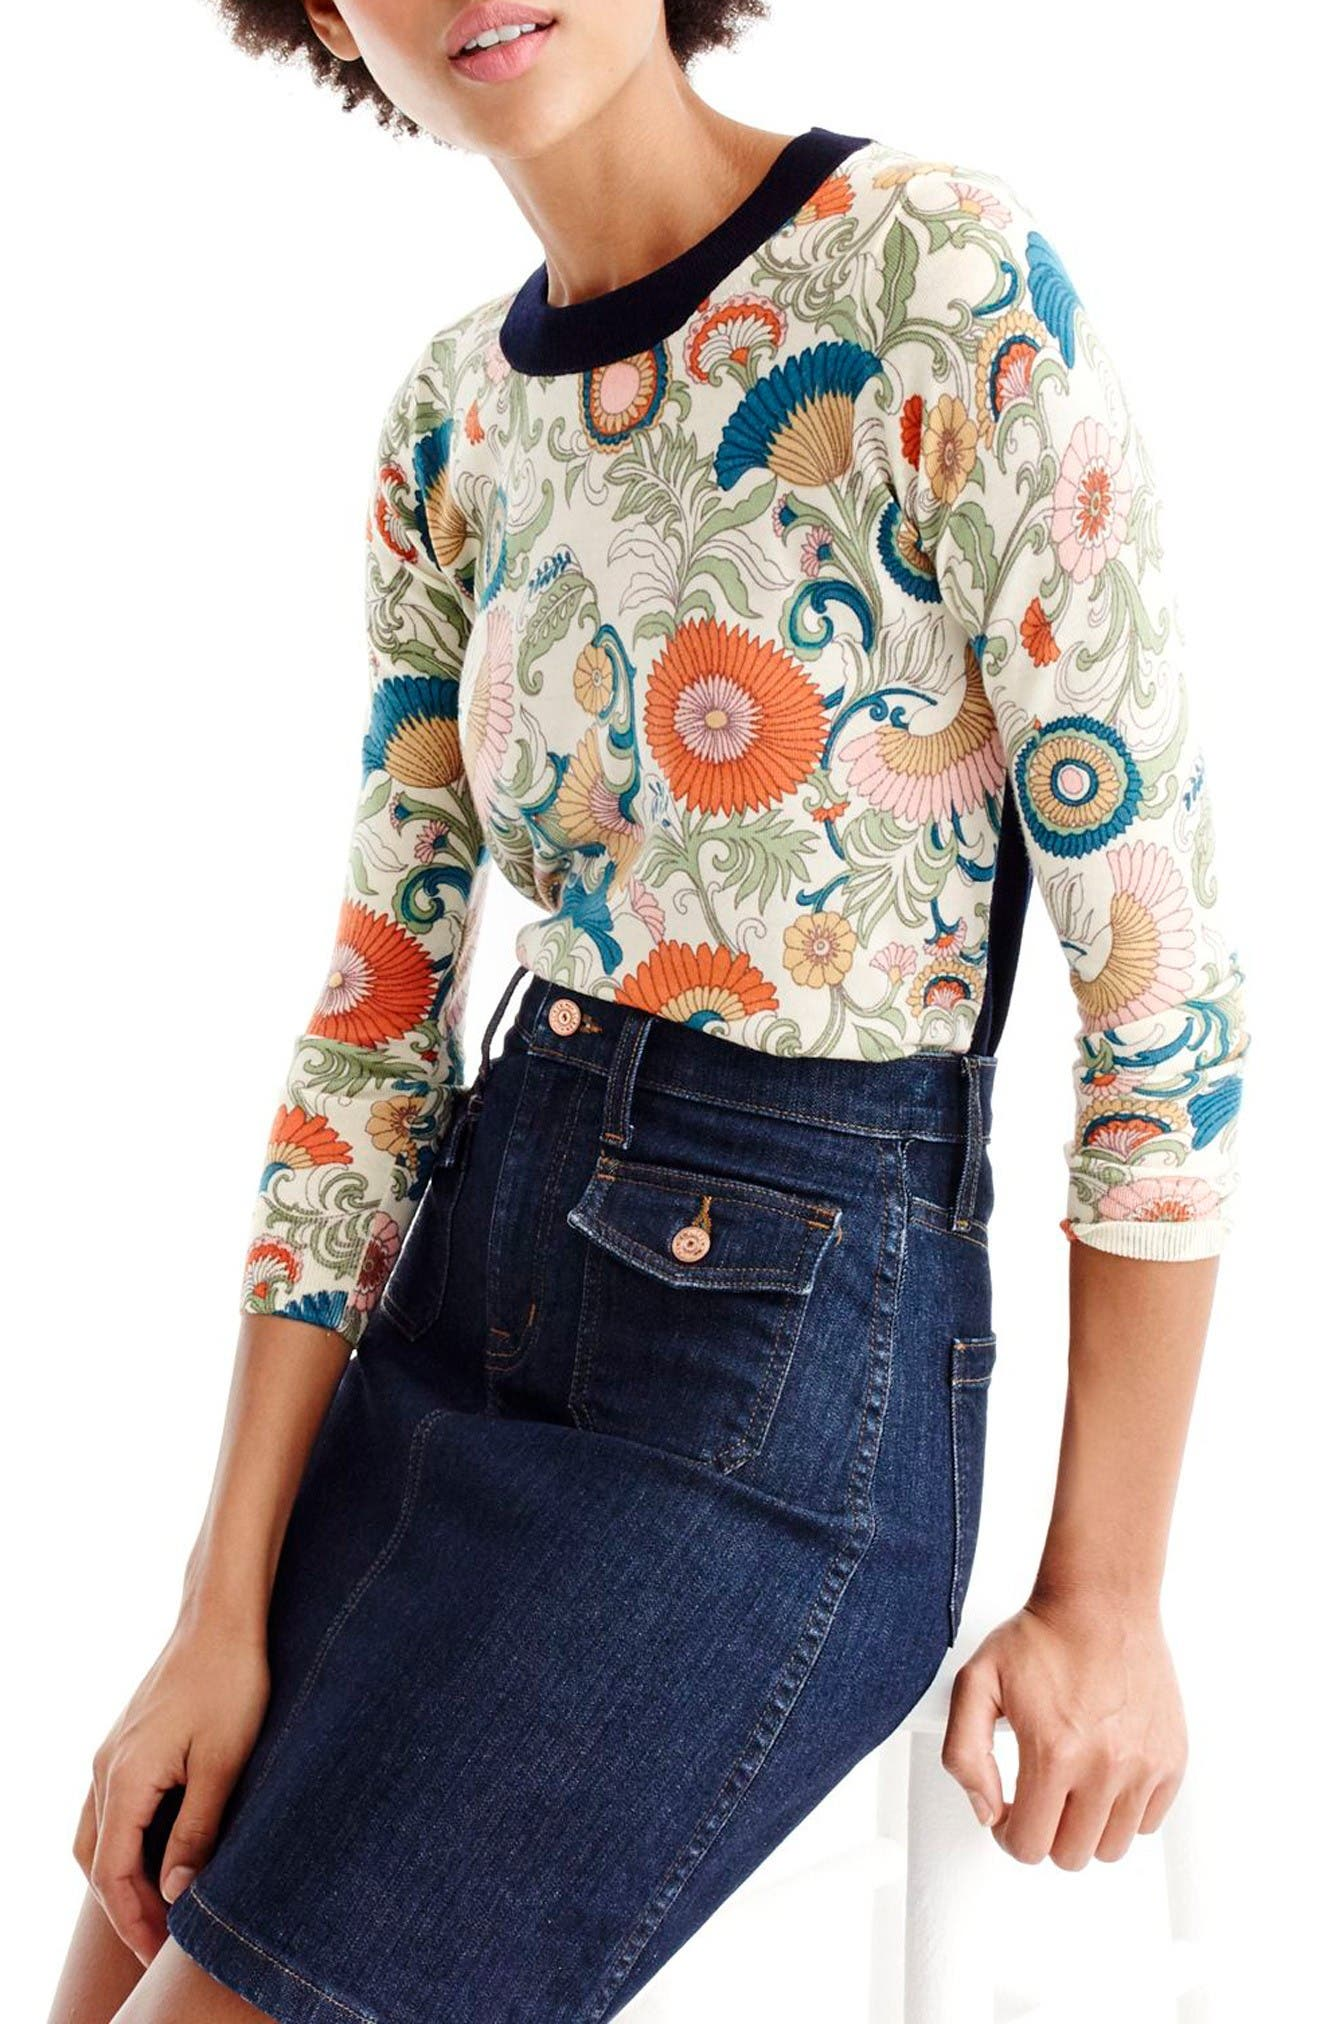 Main Image - J.Crew Tippi Ornate Floral Sweater